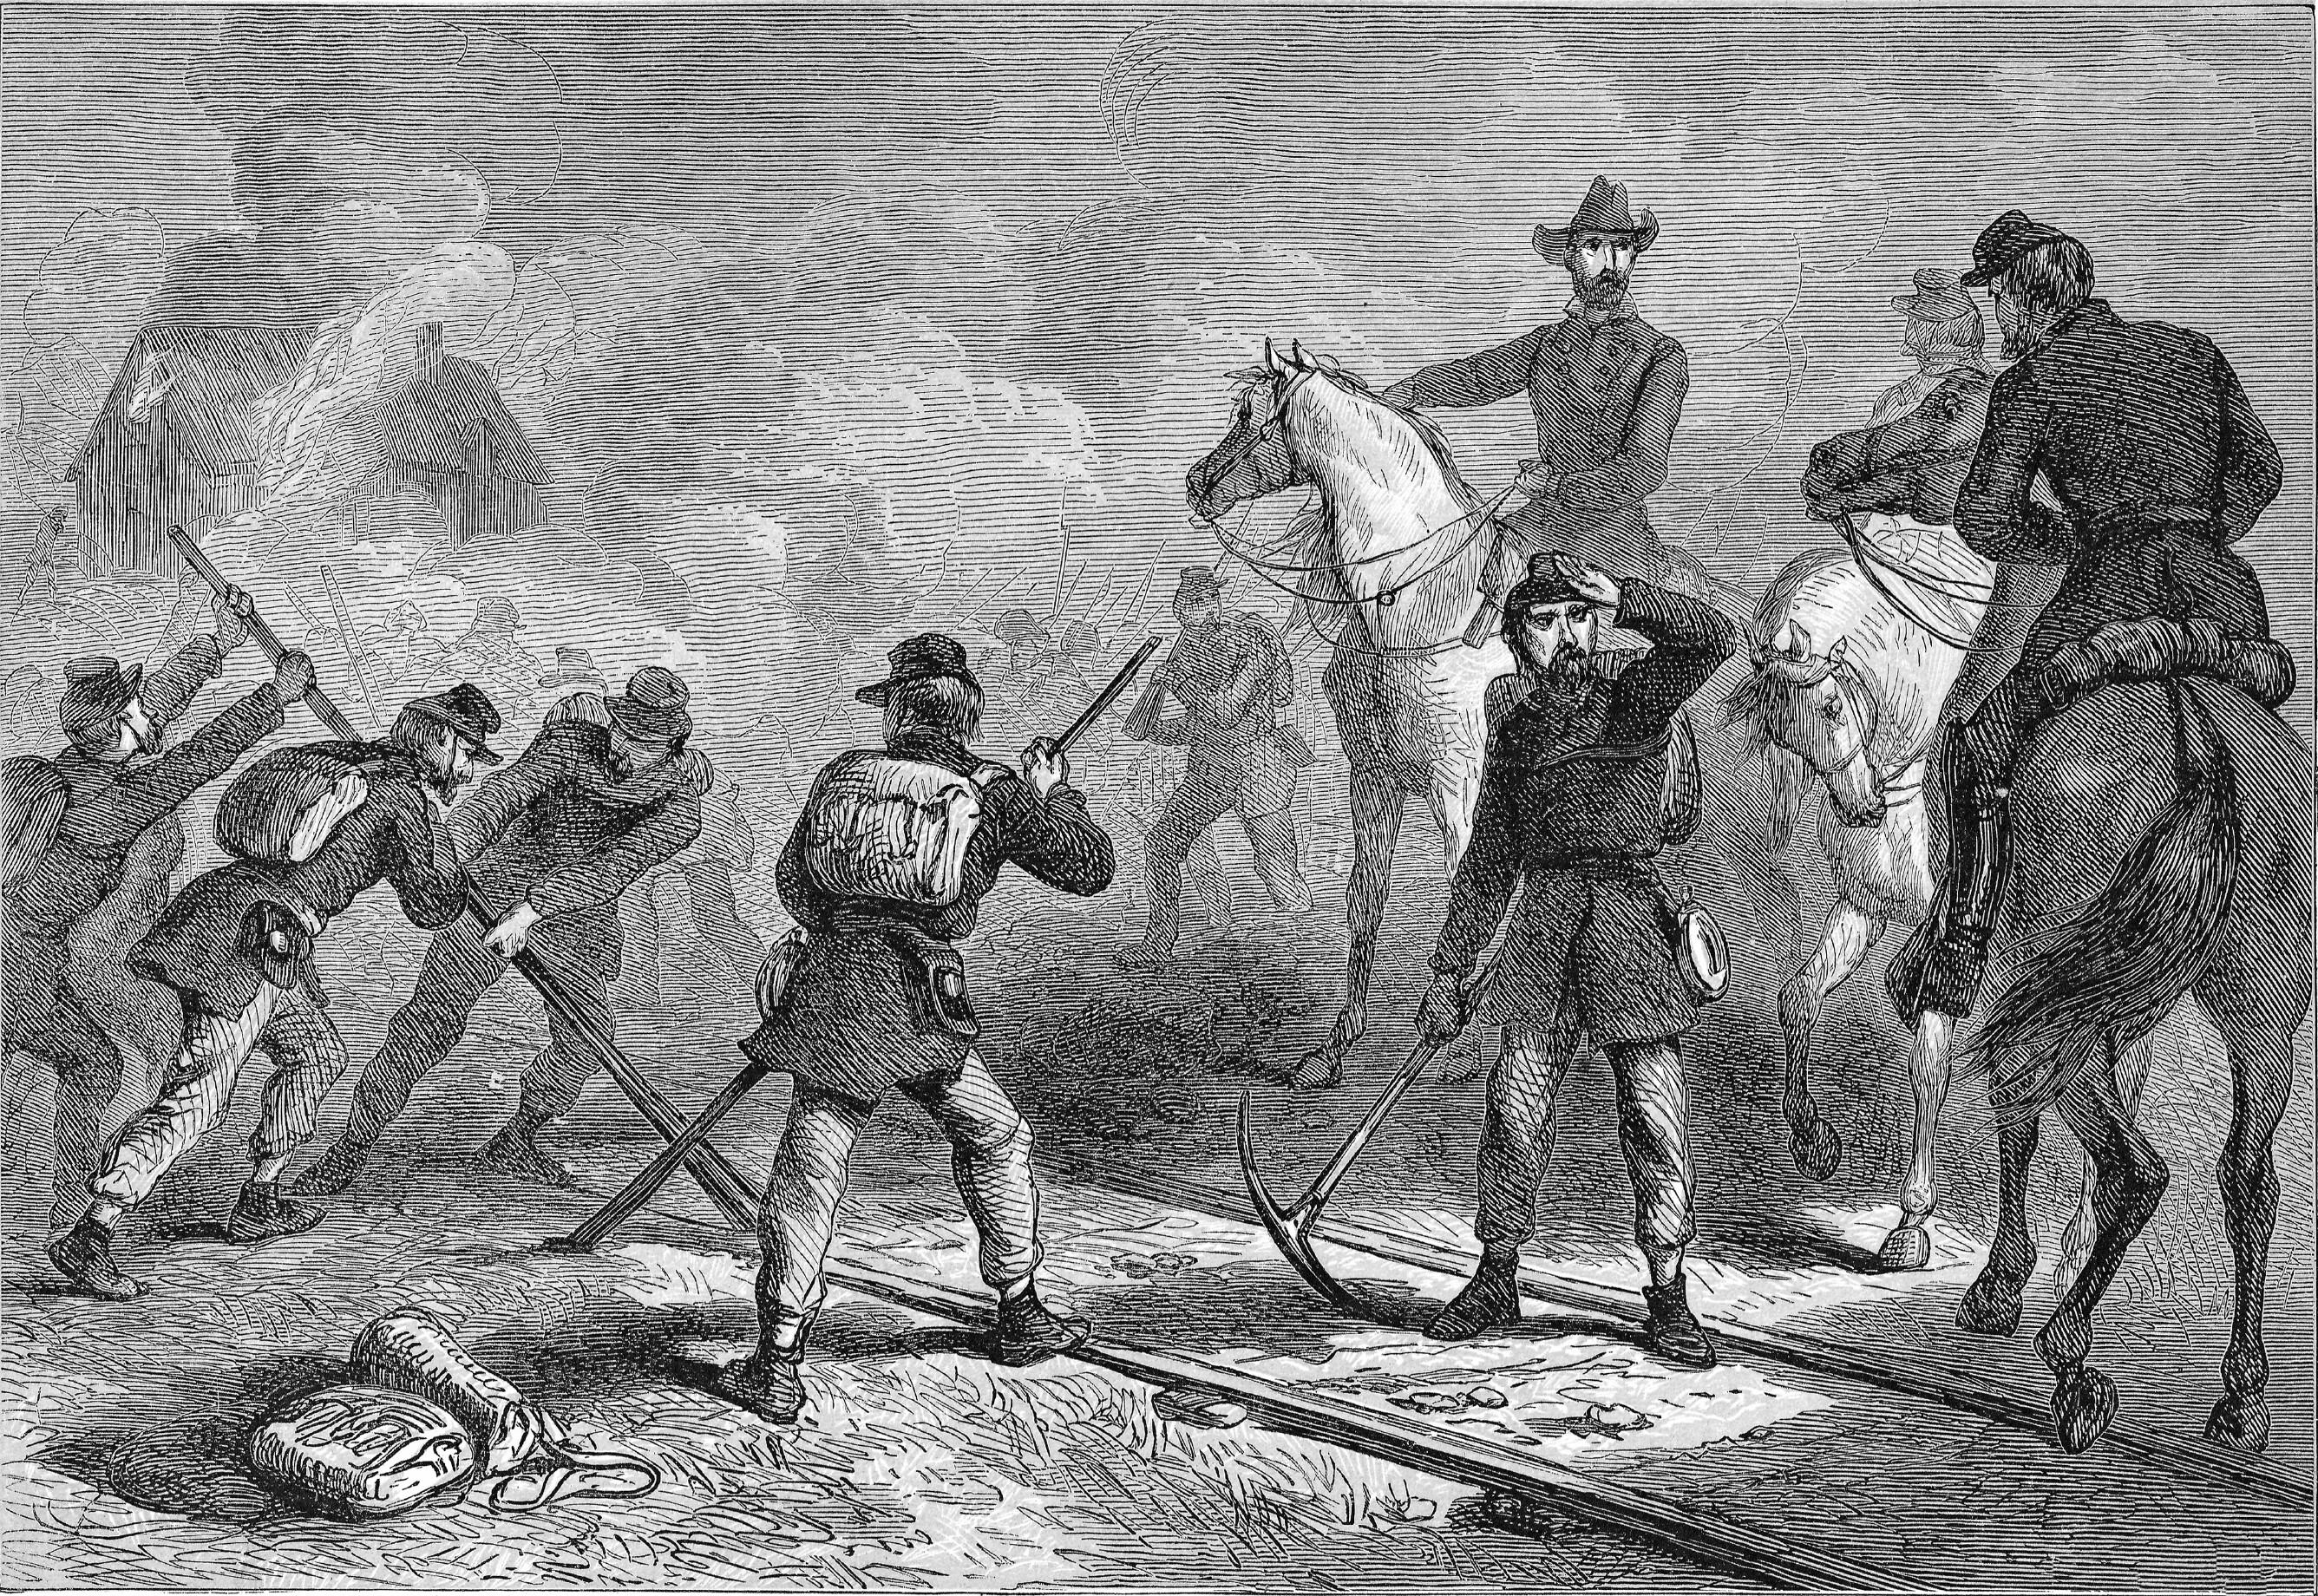 Sherman's march to the sea: Total impact warfare